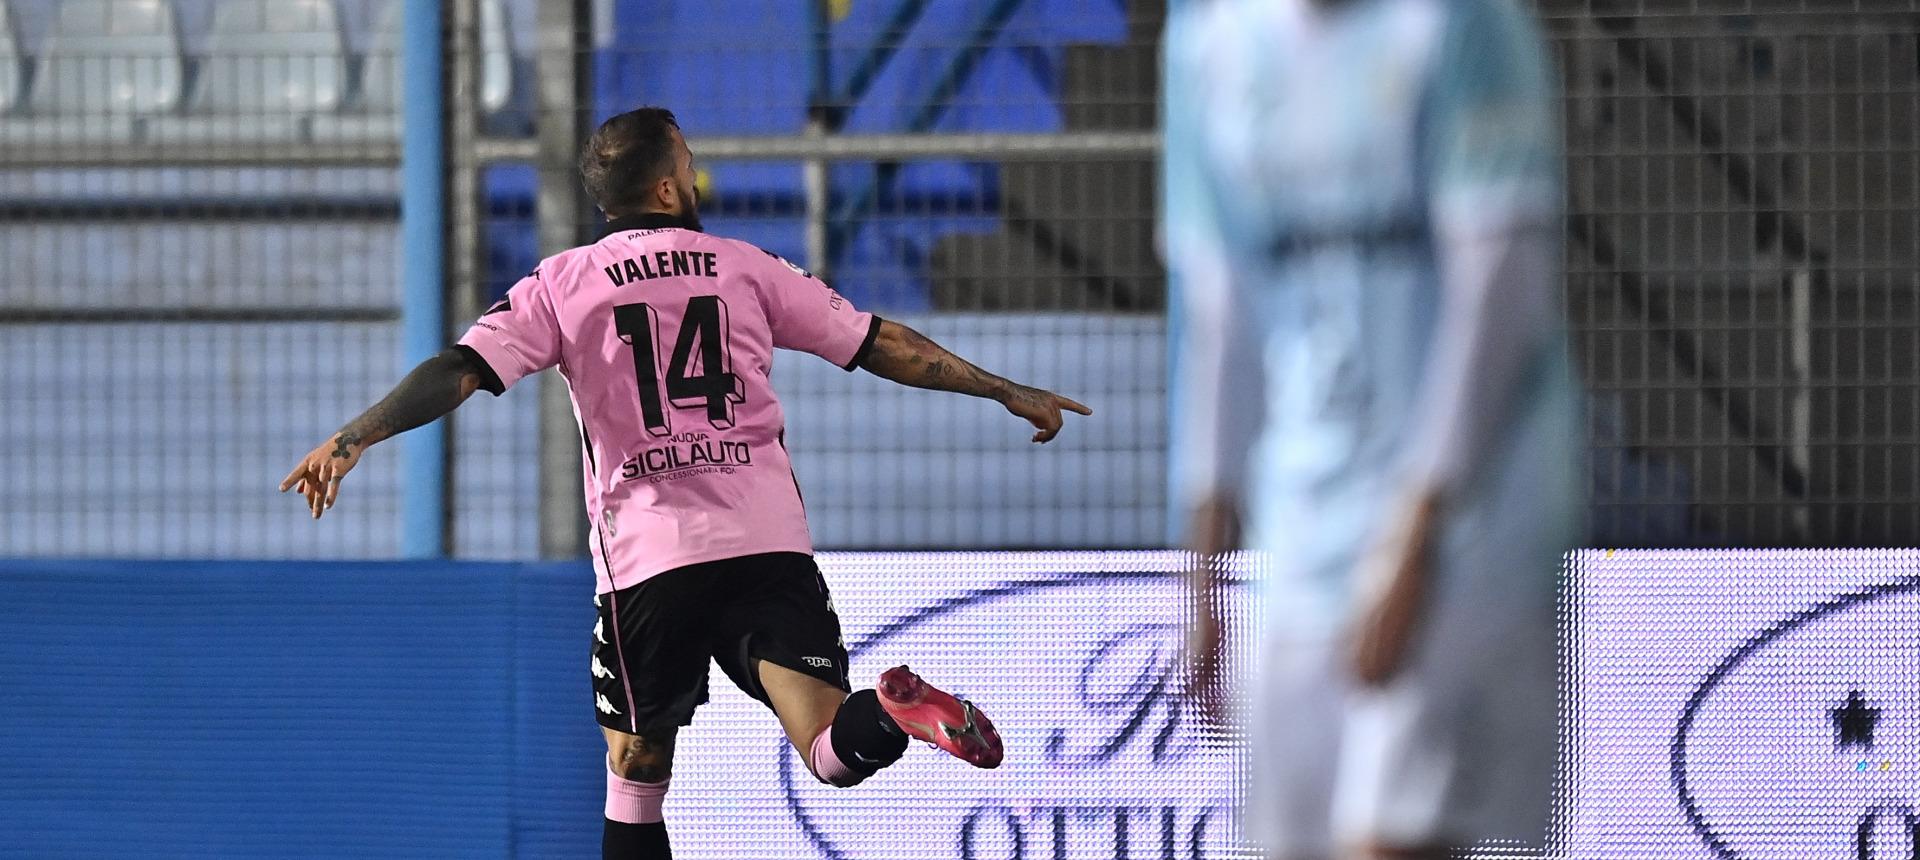 Virtus Francavilla-Palermo: Valente nel post-partita